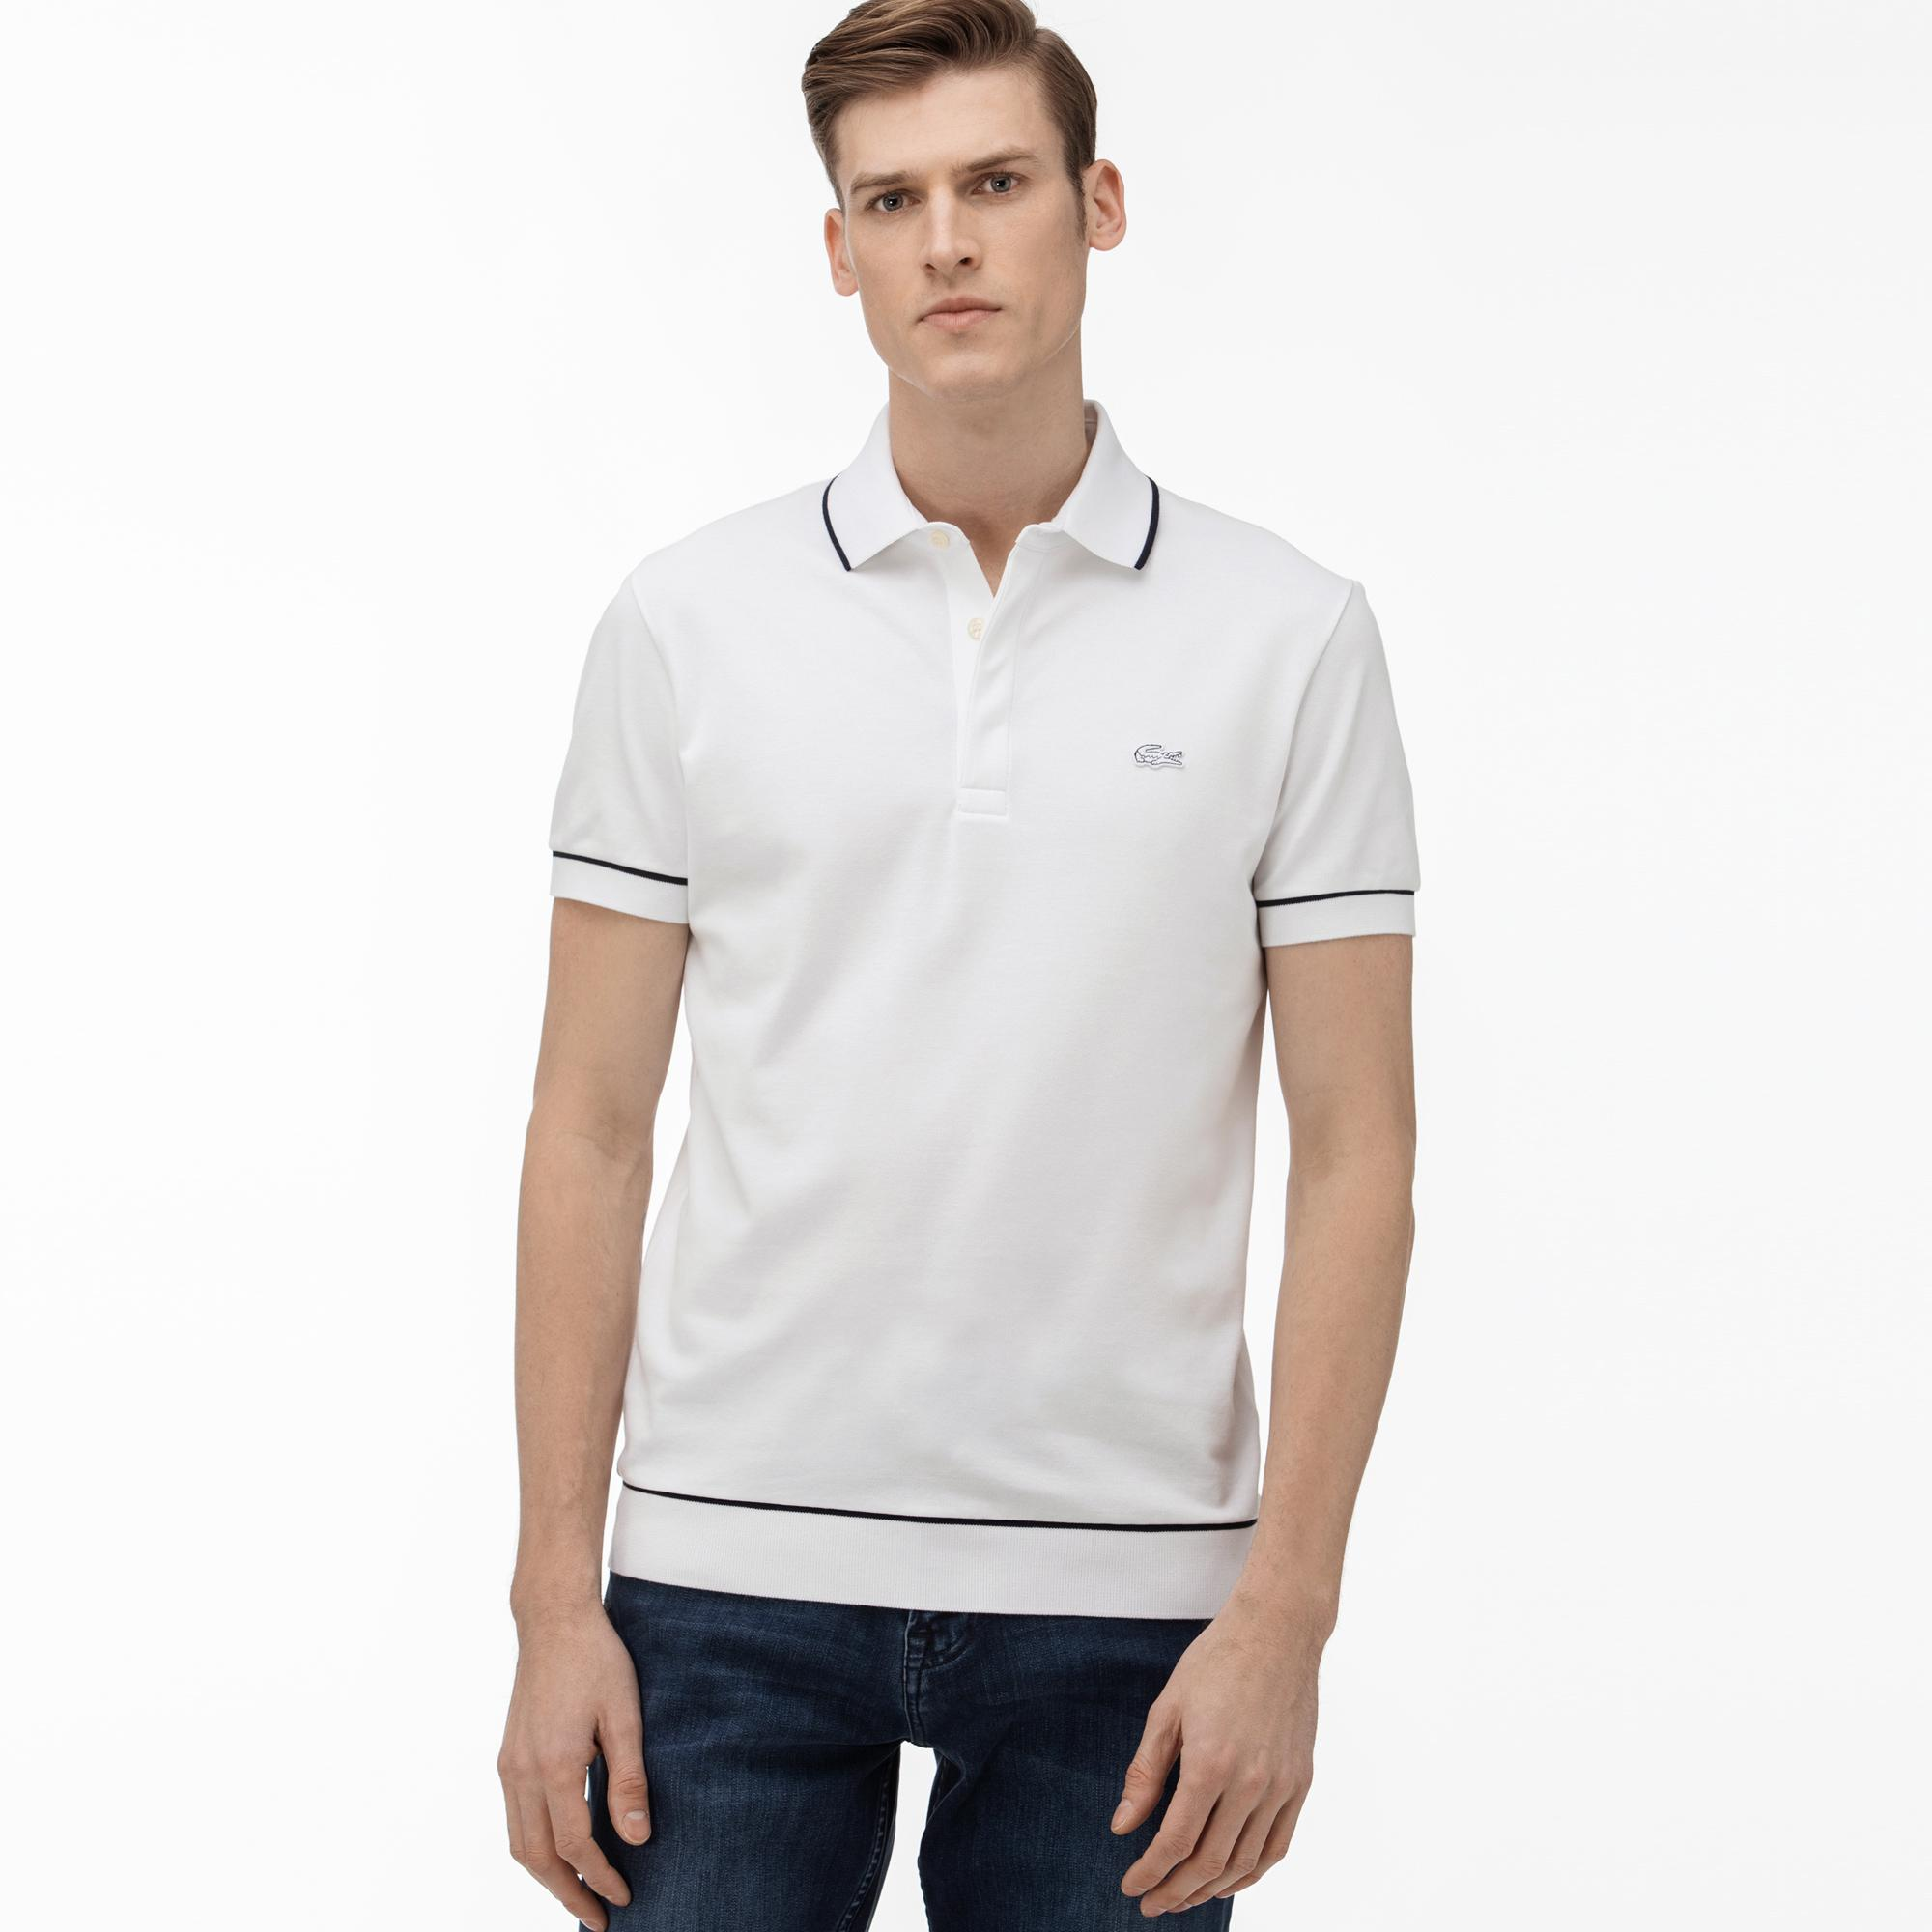 Lacoste Męska Koszulka Polo Regular Fit Czarna